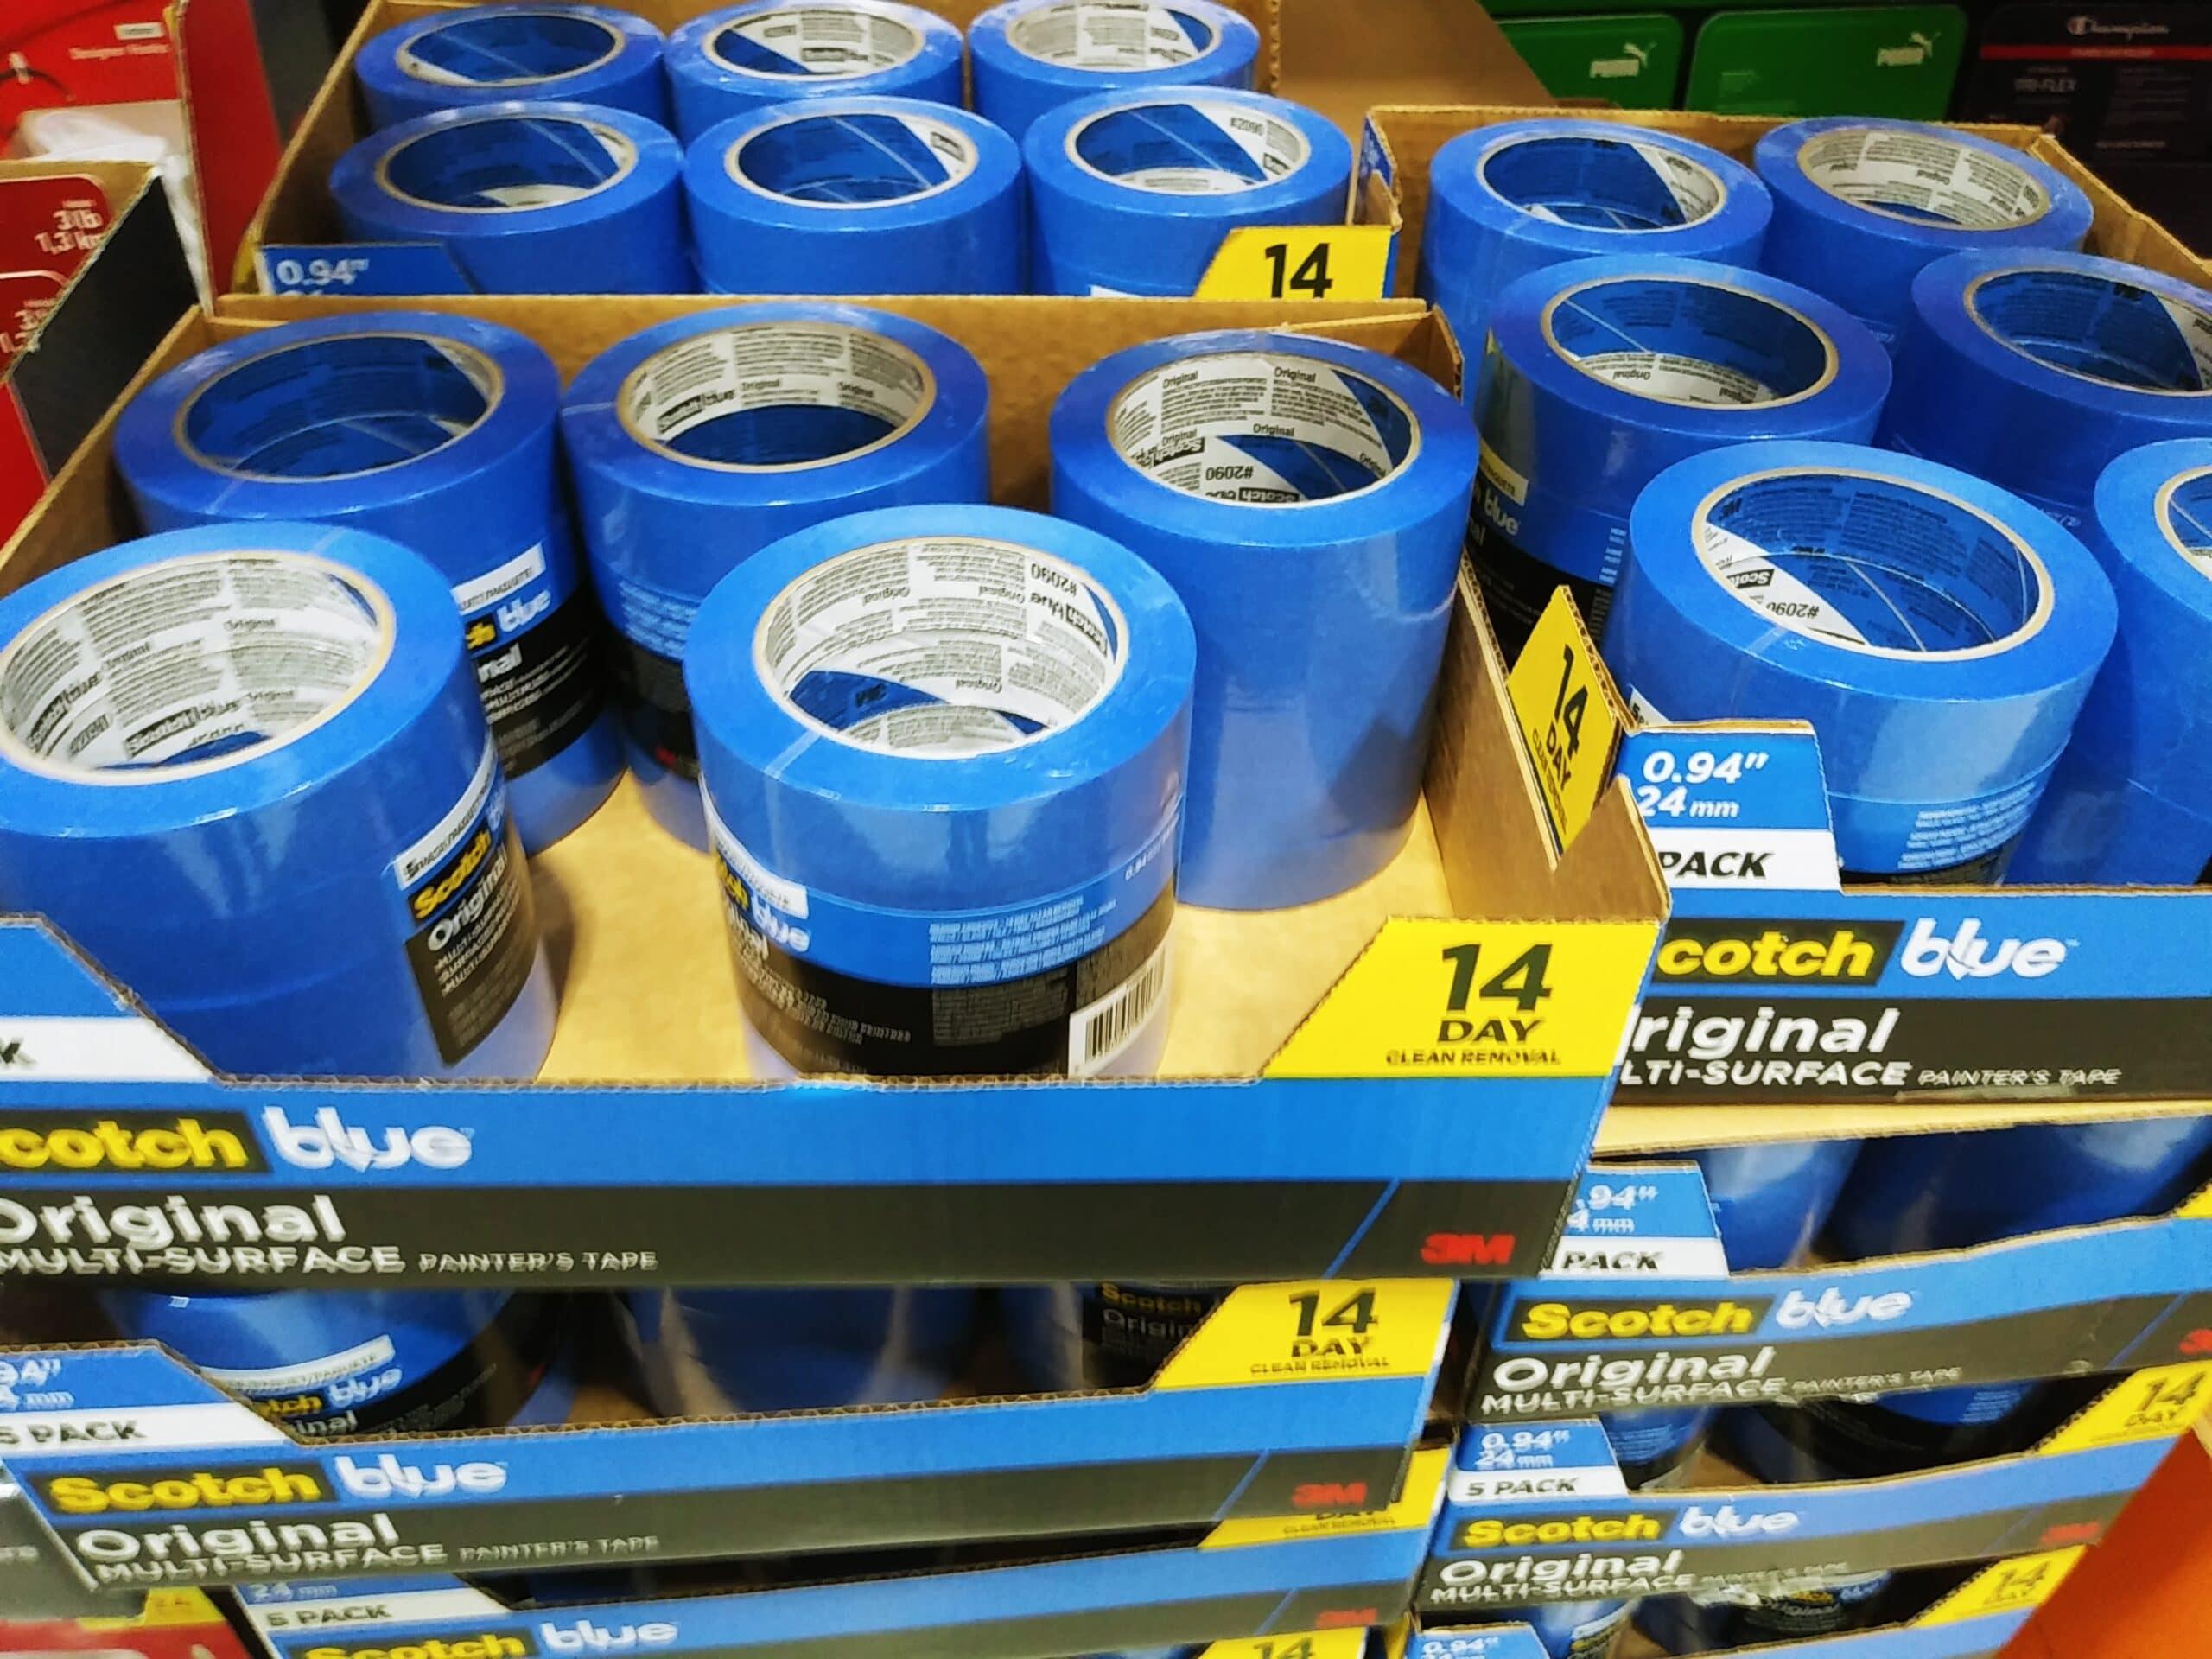 Scotch Blue Tape 5pk $6.97